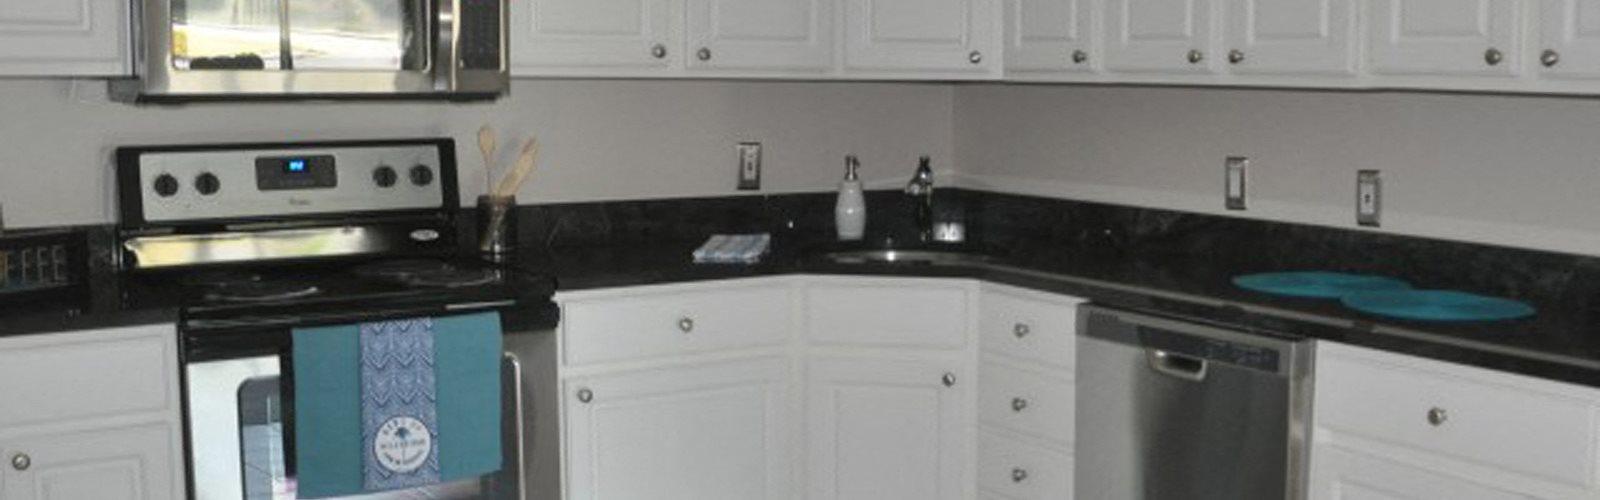 Granite Countertops at Summit Terrace, Maine, 04106